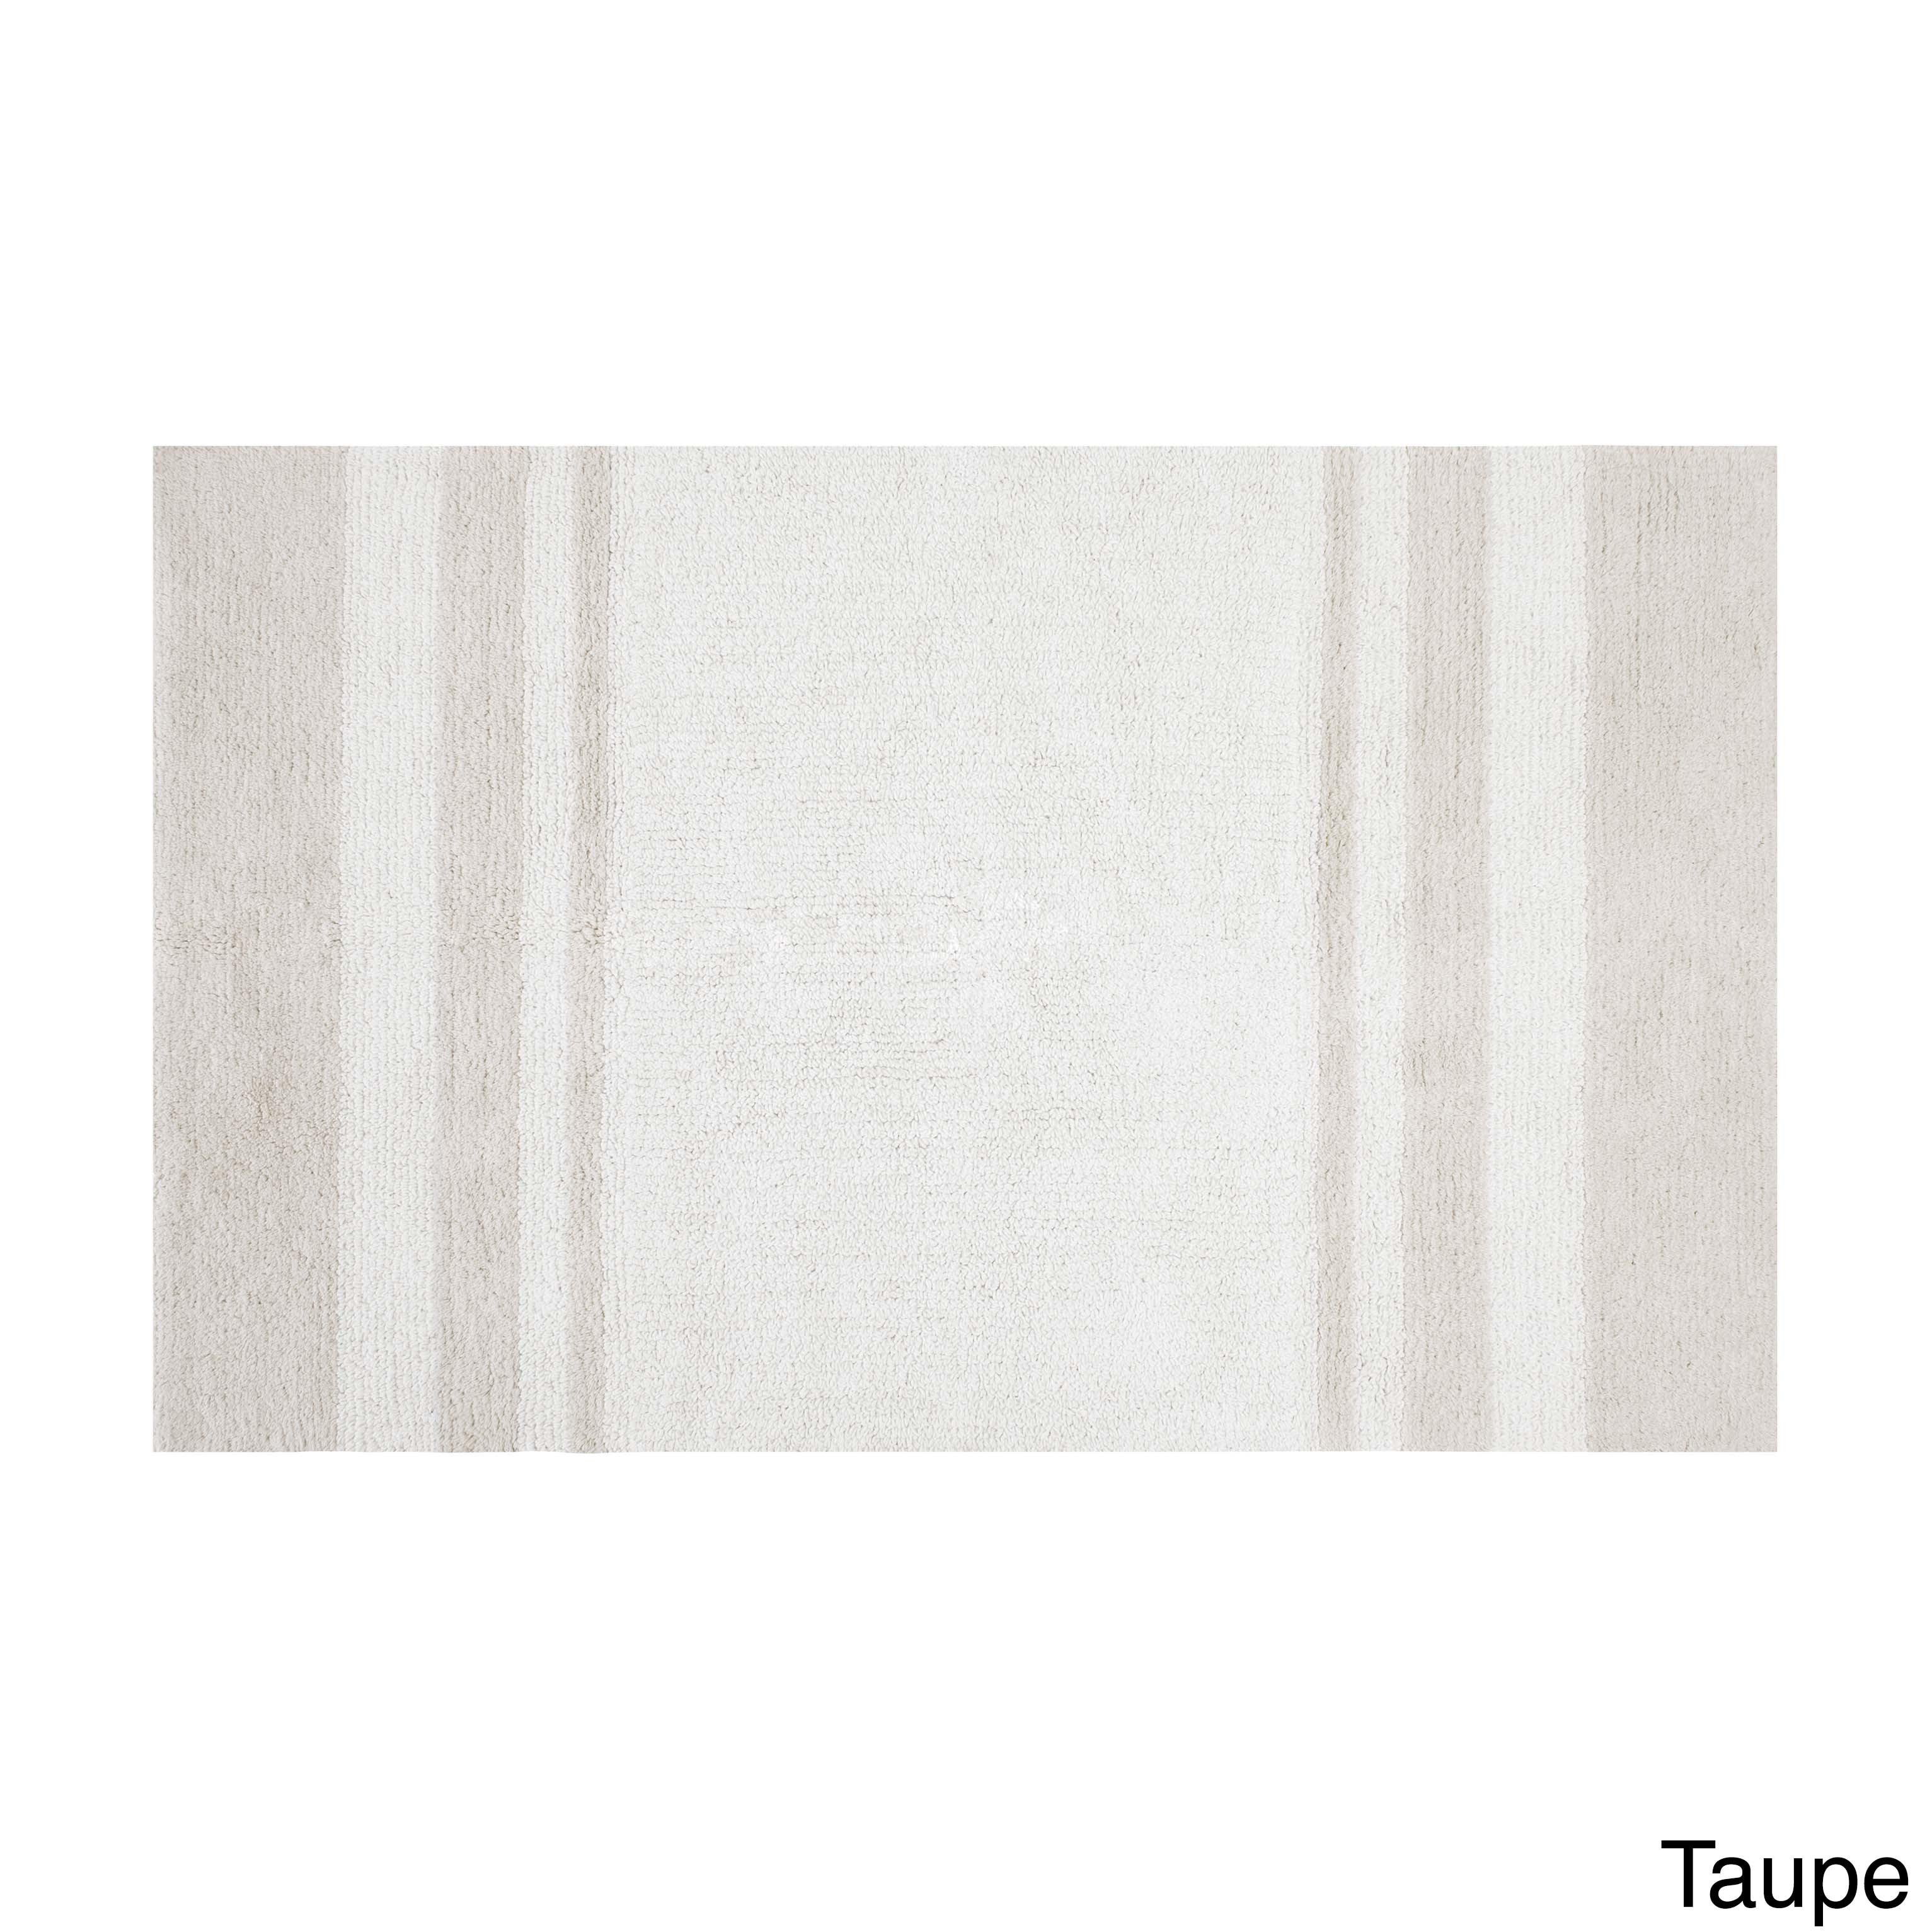 30 x 72 bath rug blue | home & garden | compare prices at nextag